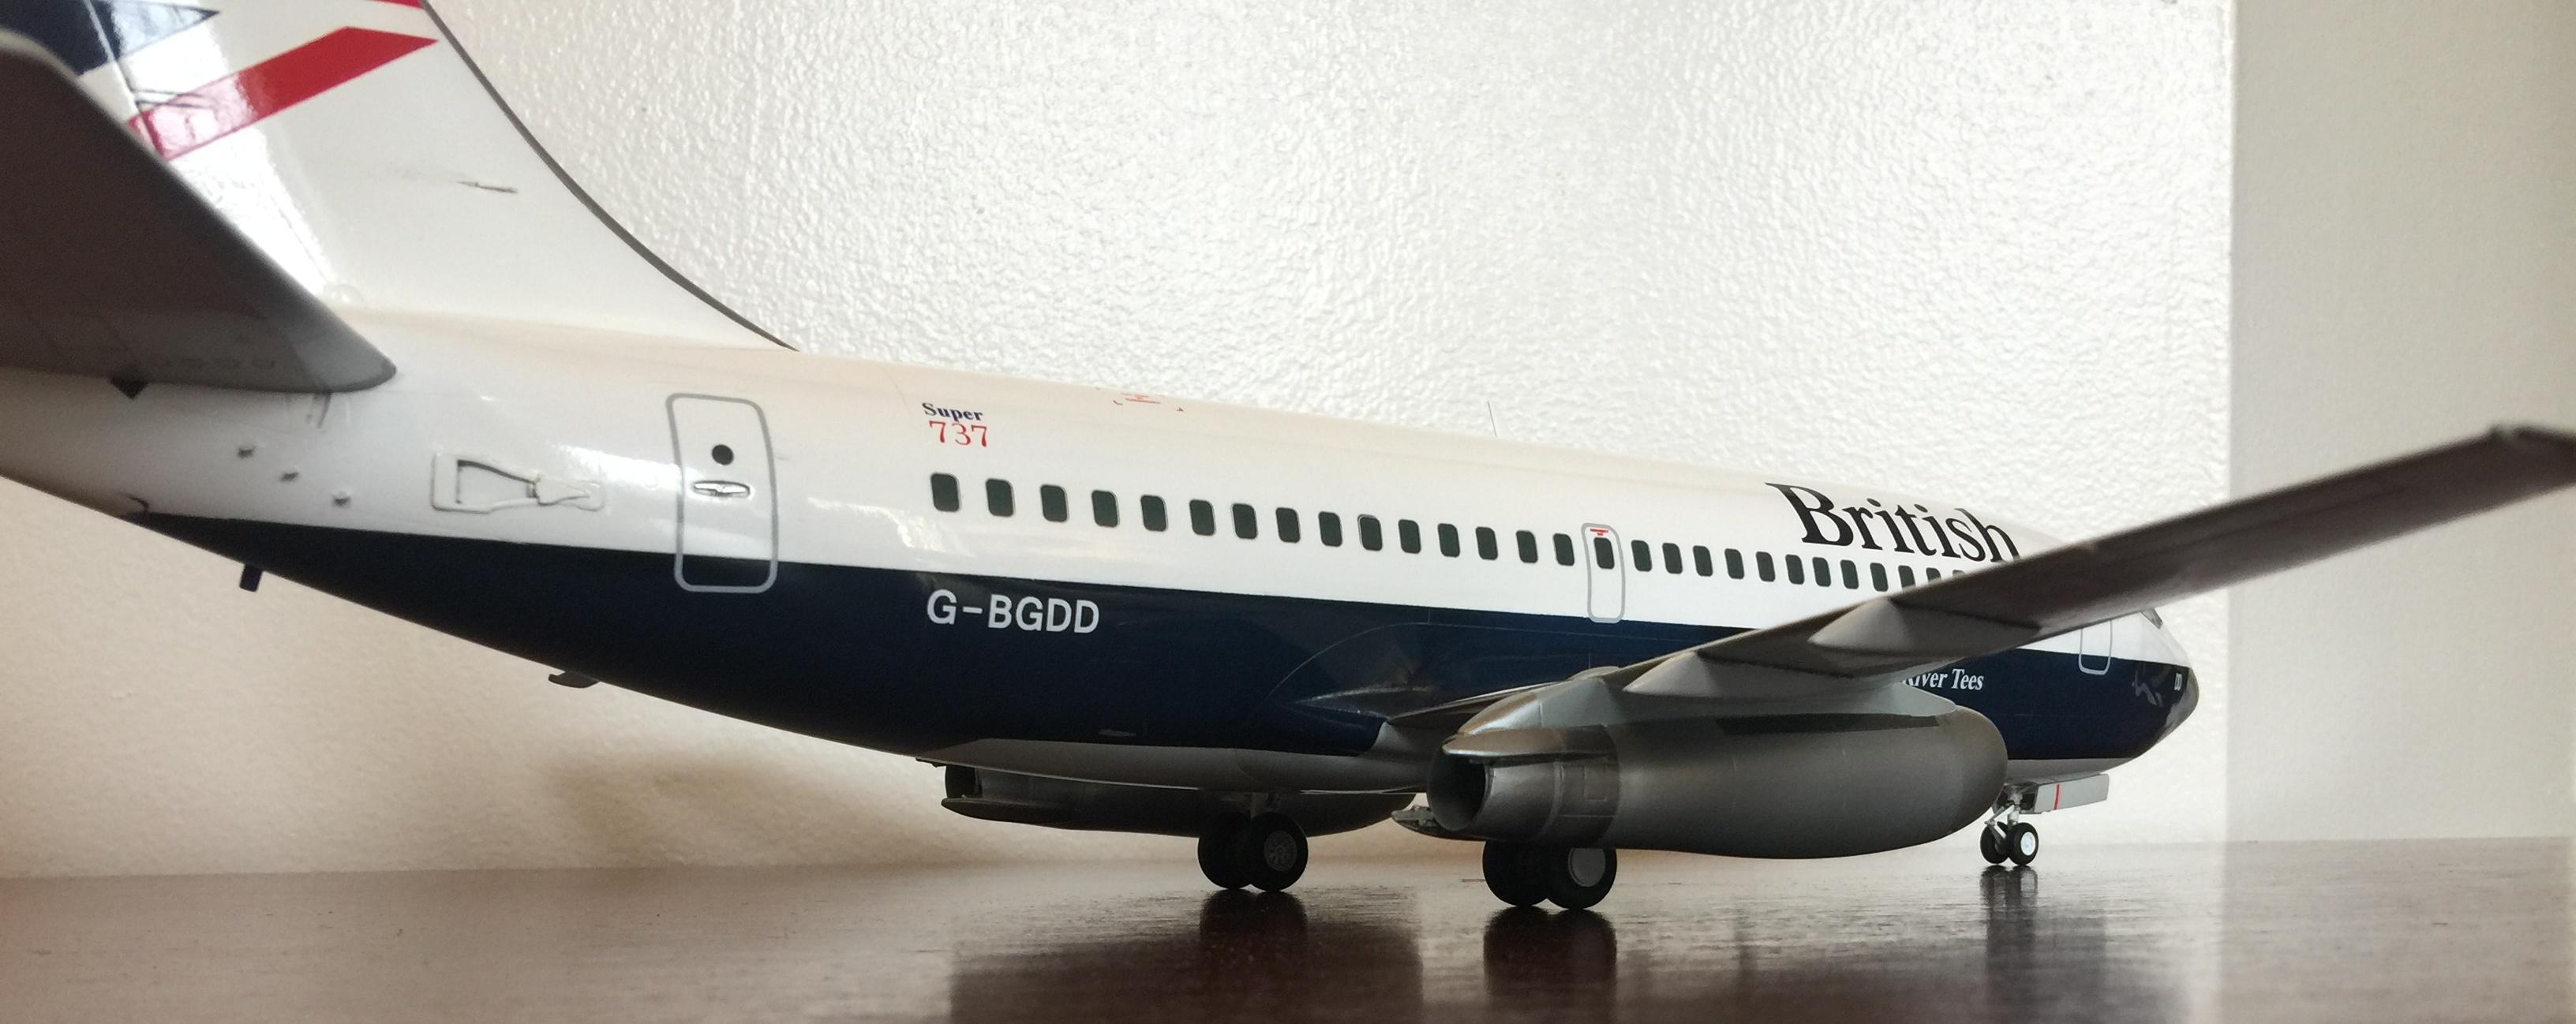 737-stbd-rear-qtr-low